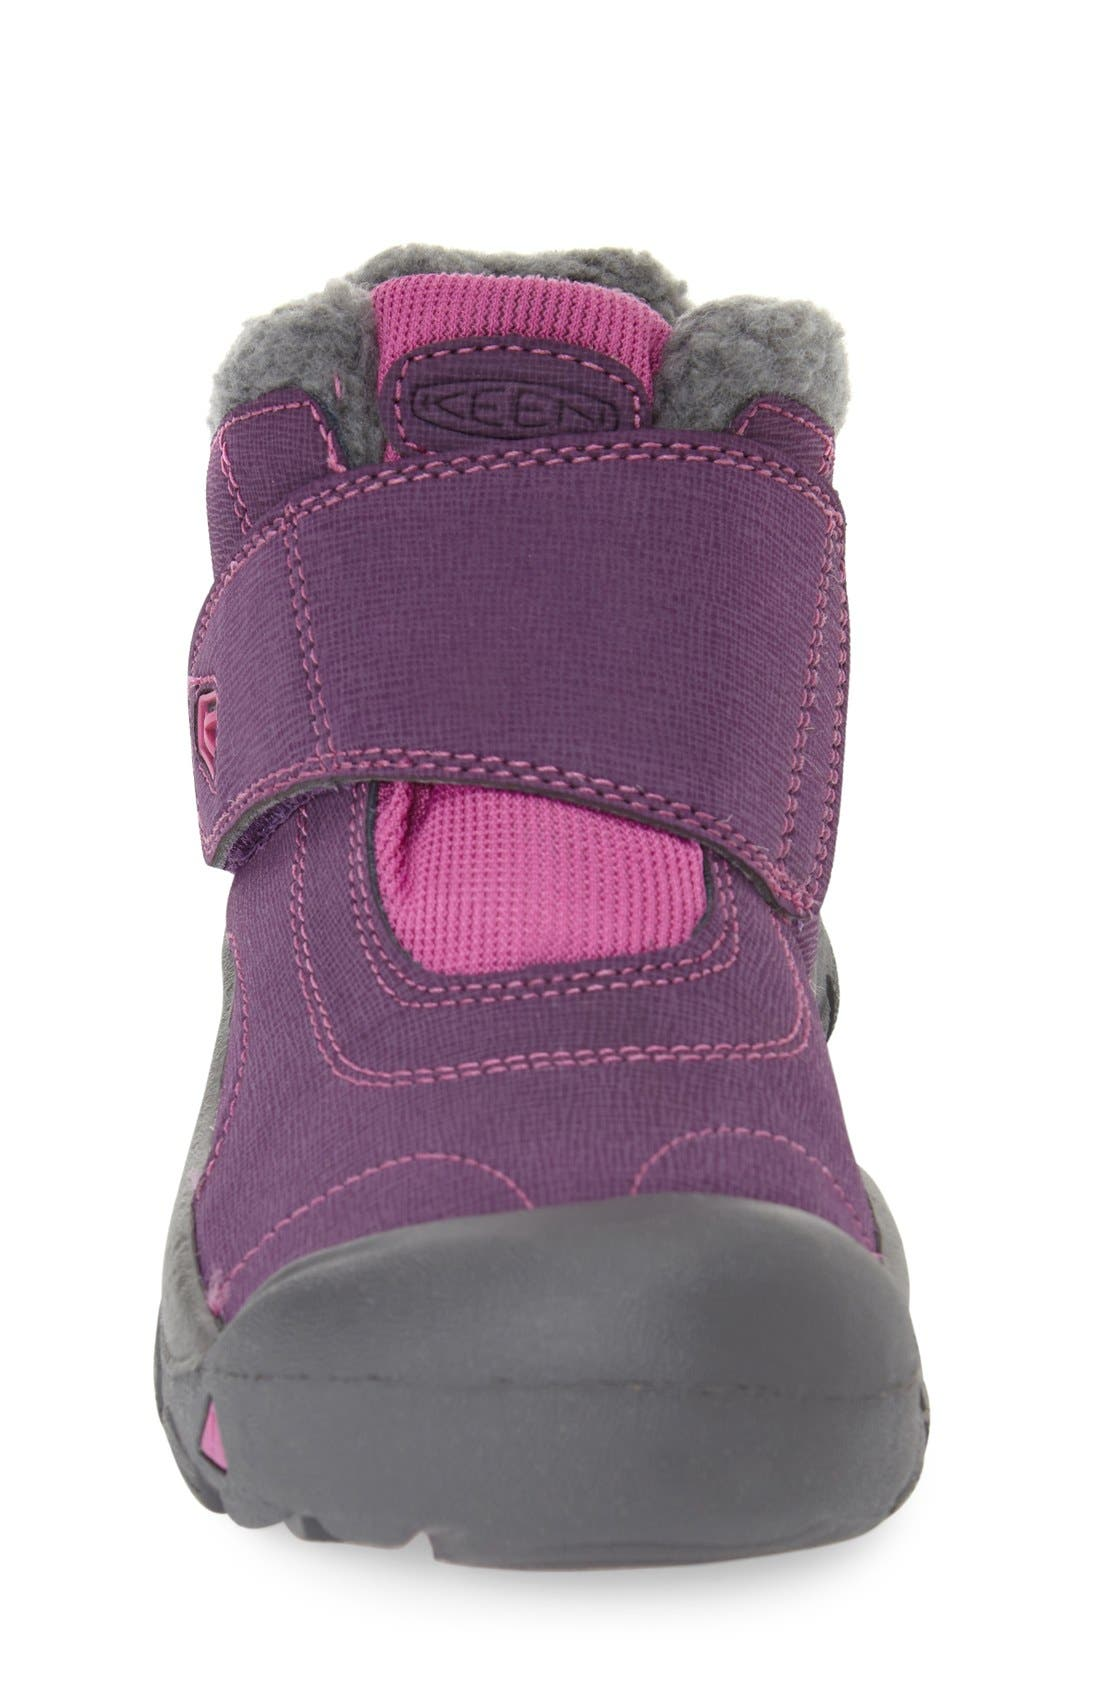 Alternate Image 3  - Keen 'Kootenay' Waterproof Winter Boot (Walker, Toddler, Little Kid & Big Kid)